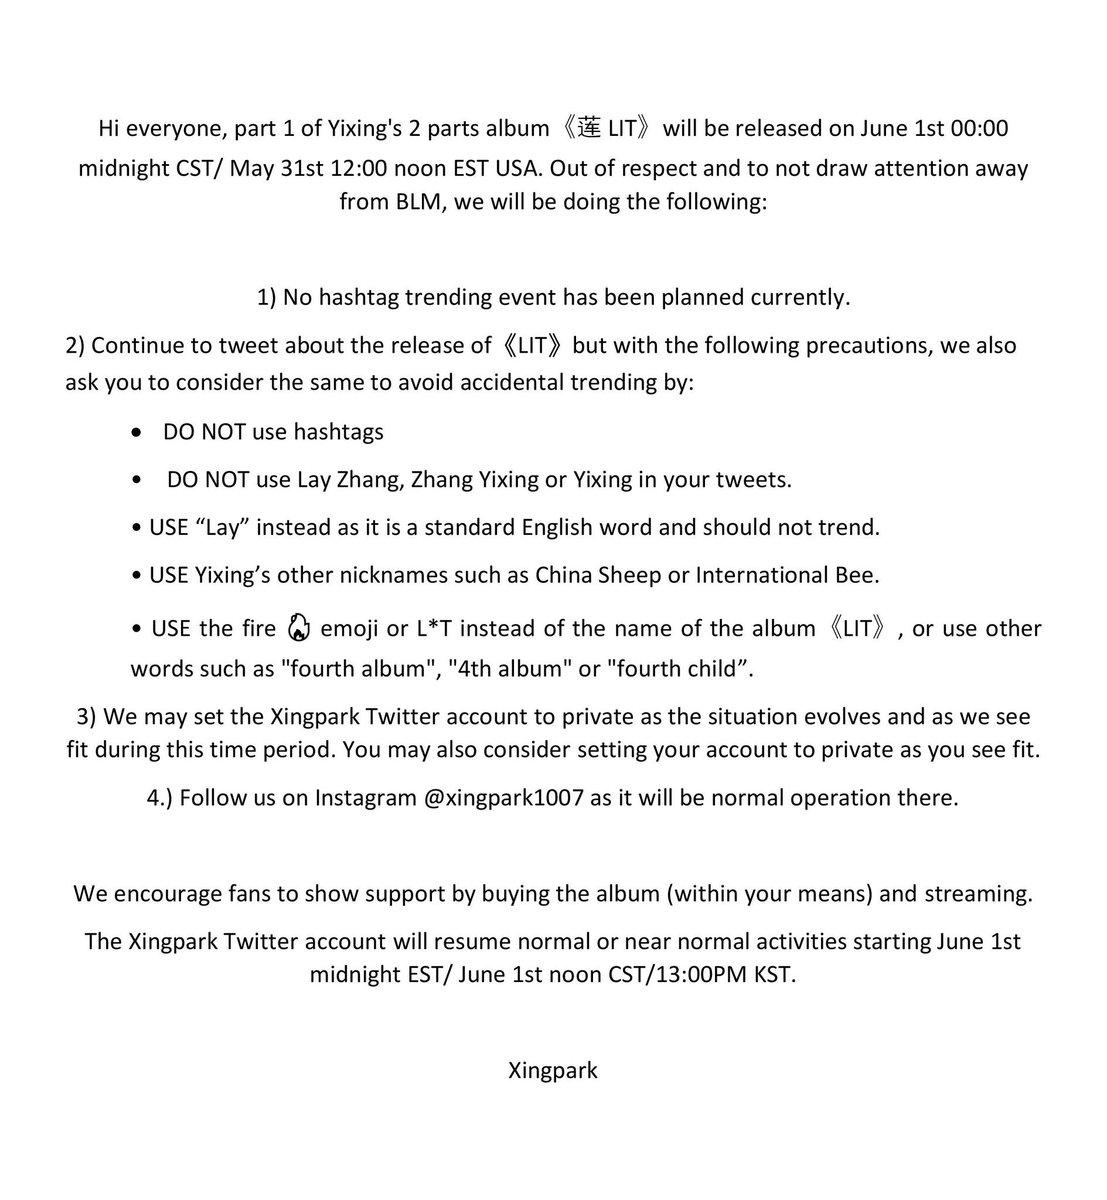 @weareoneEXO @layzhang EXOL PLEASE READ THIS 🔥🔥🔥 https://t.co/U1zgi372xg